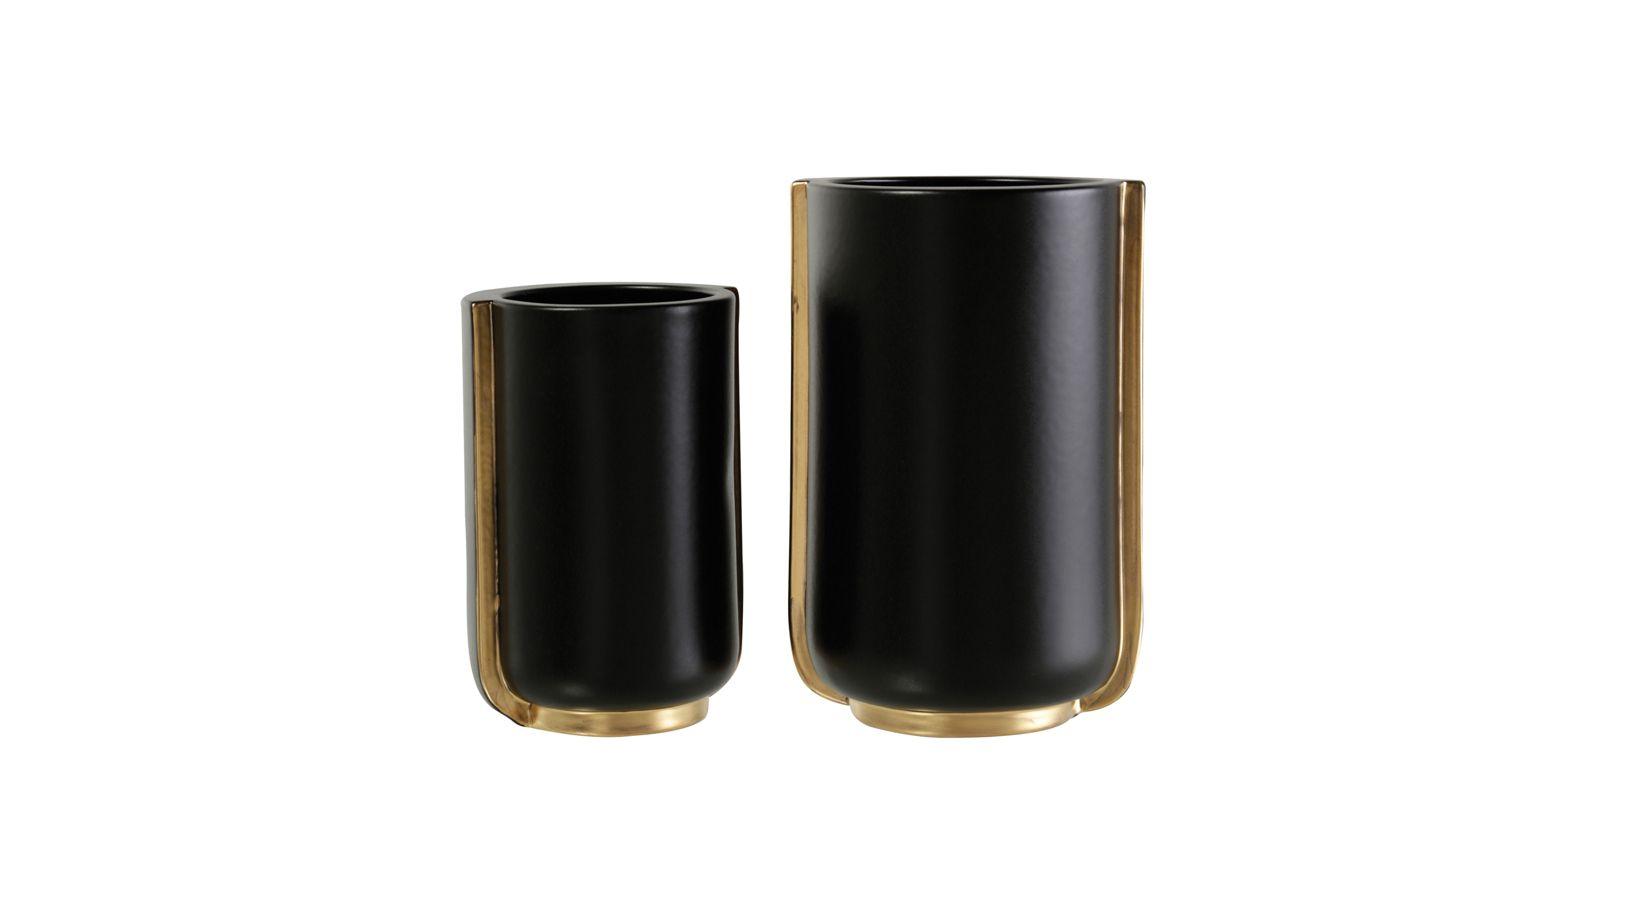 Midway Vase Roche Bobois